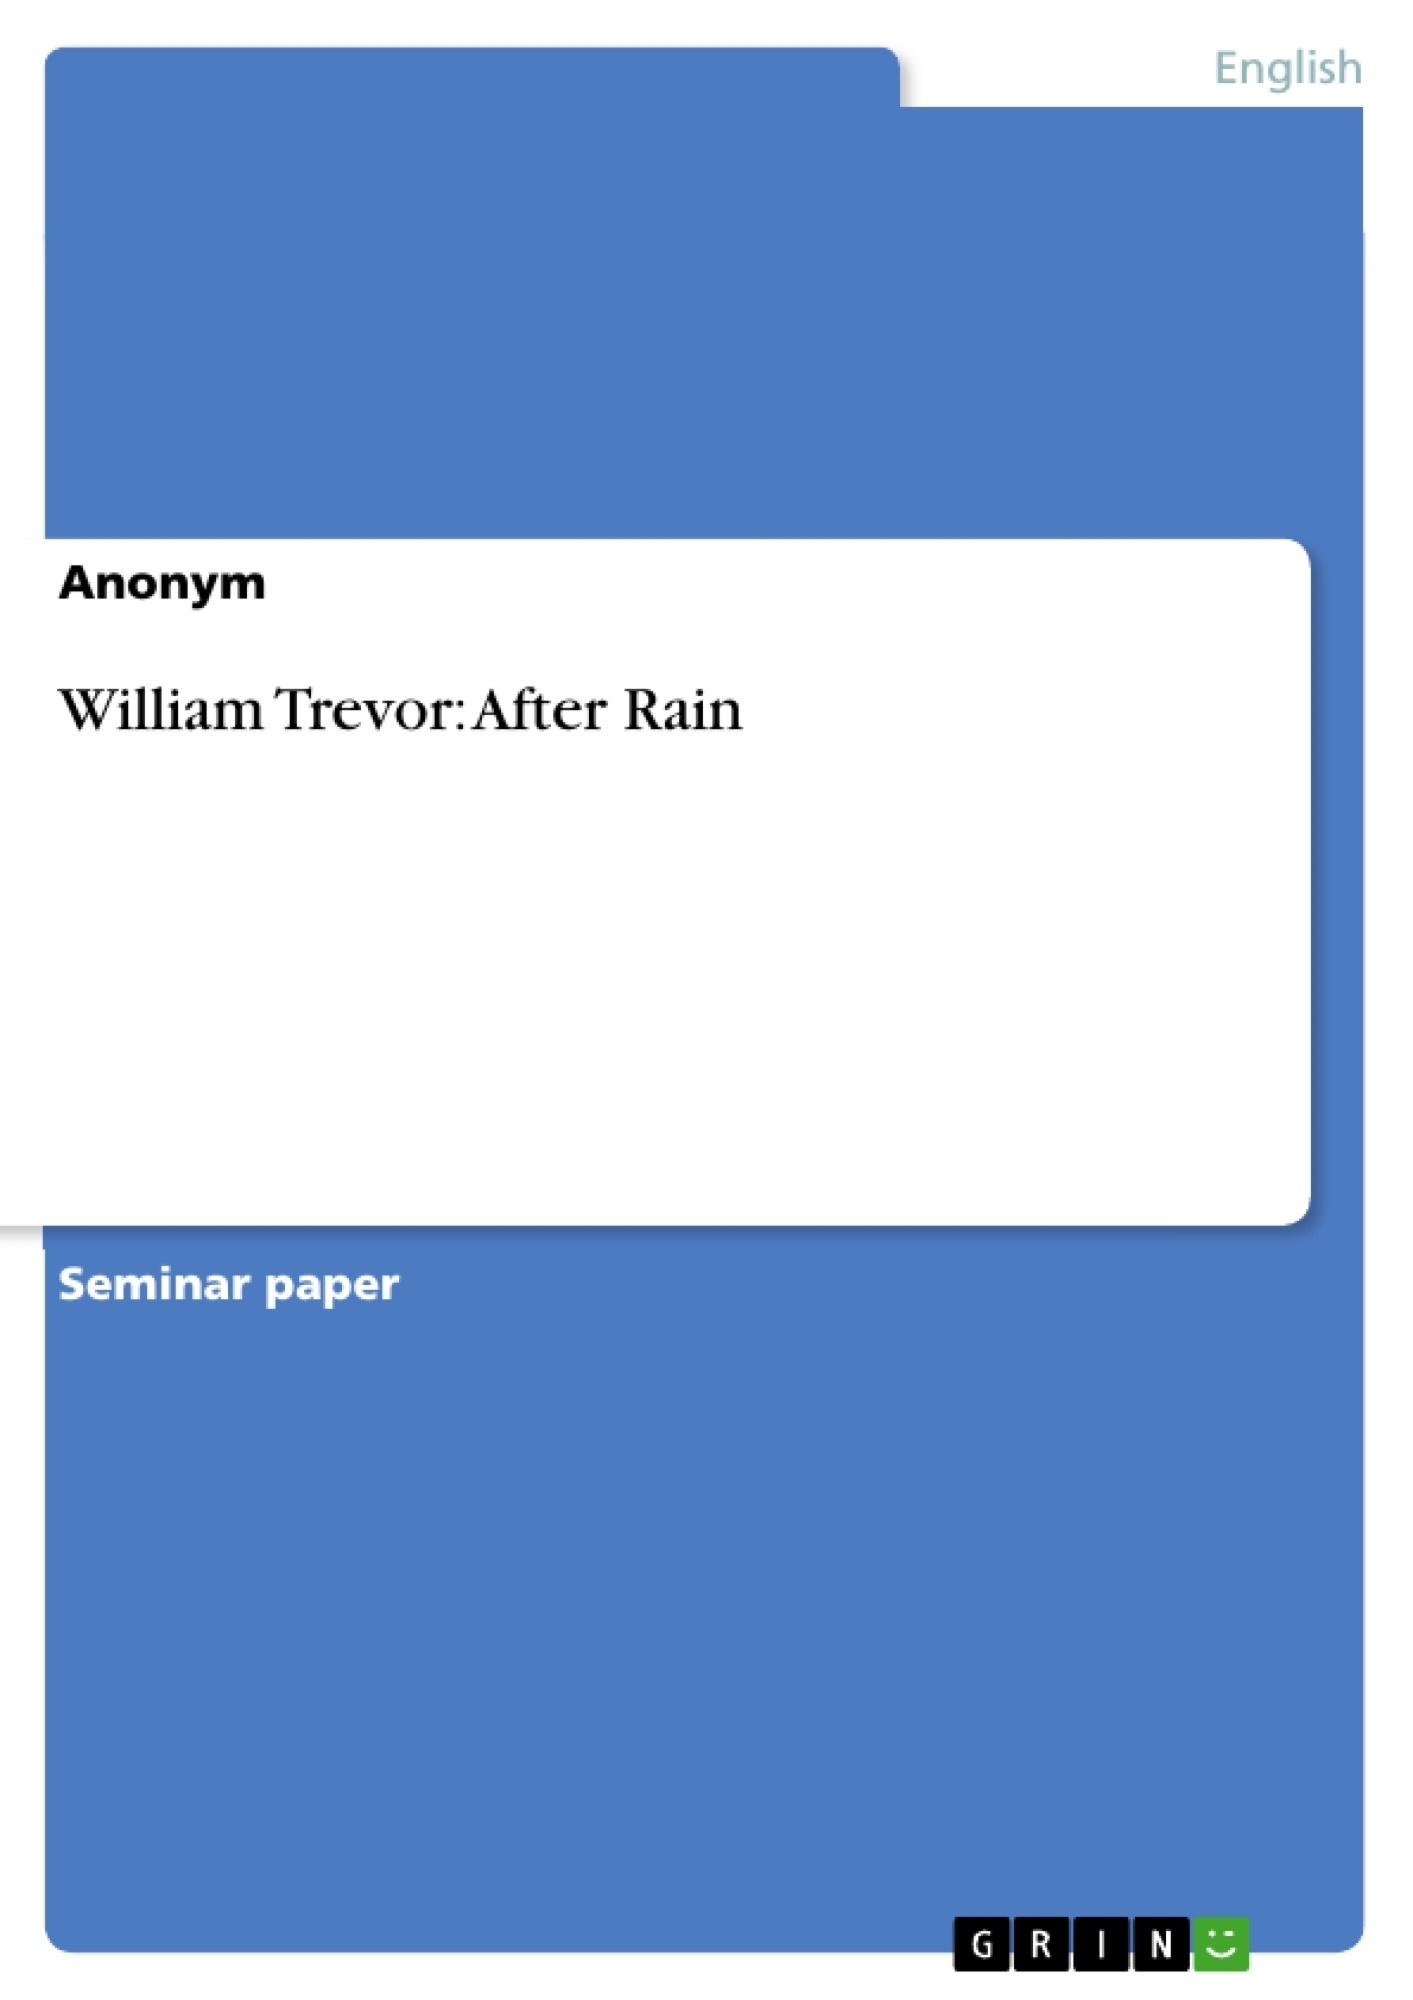 Title: William Trevor: After Rain